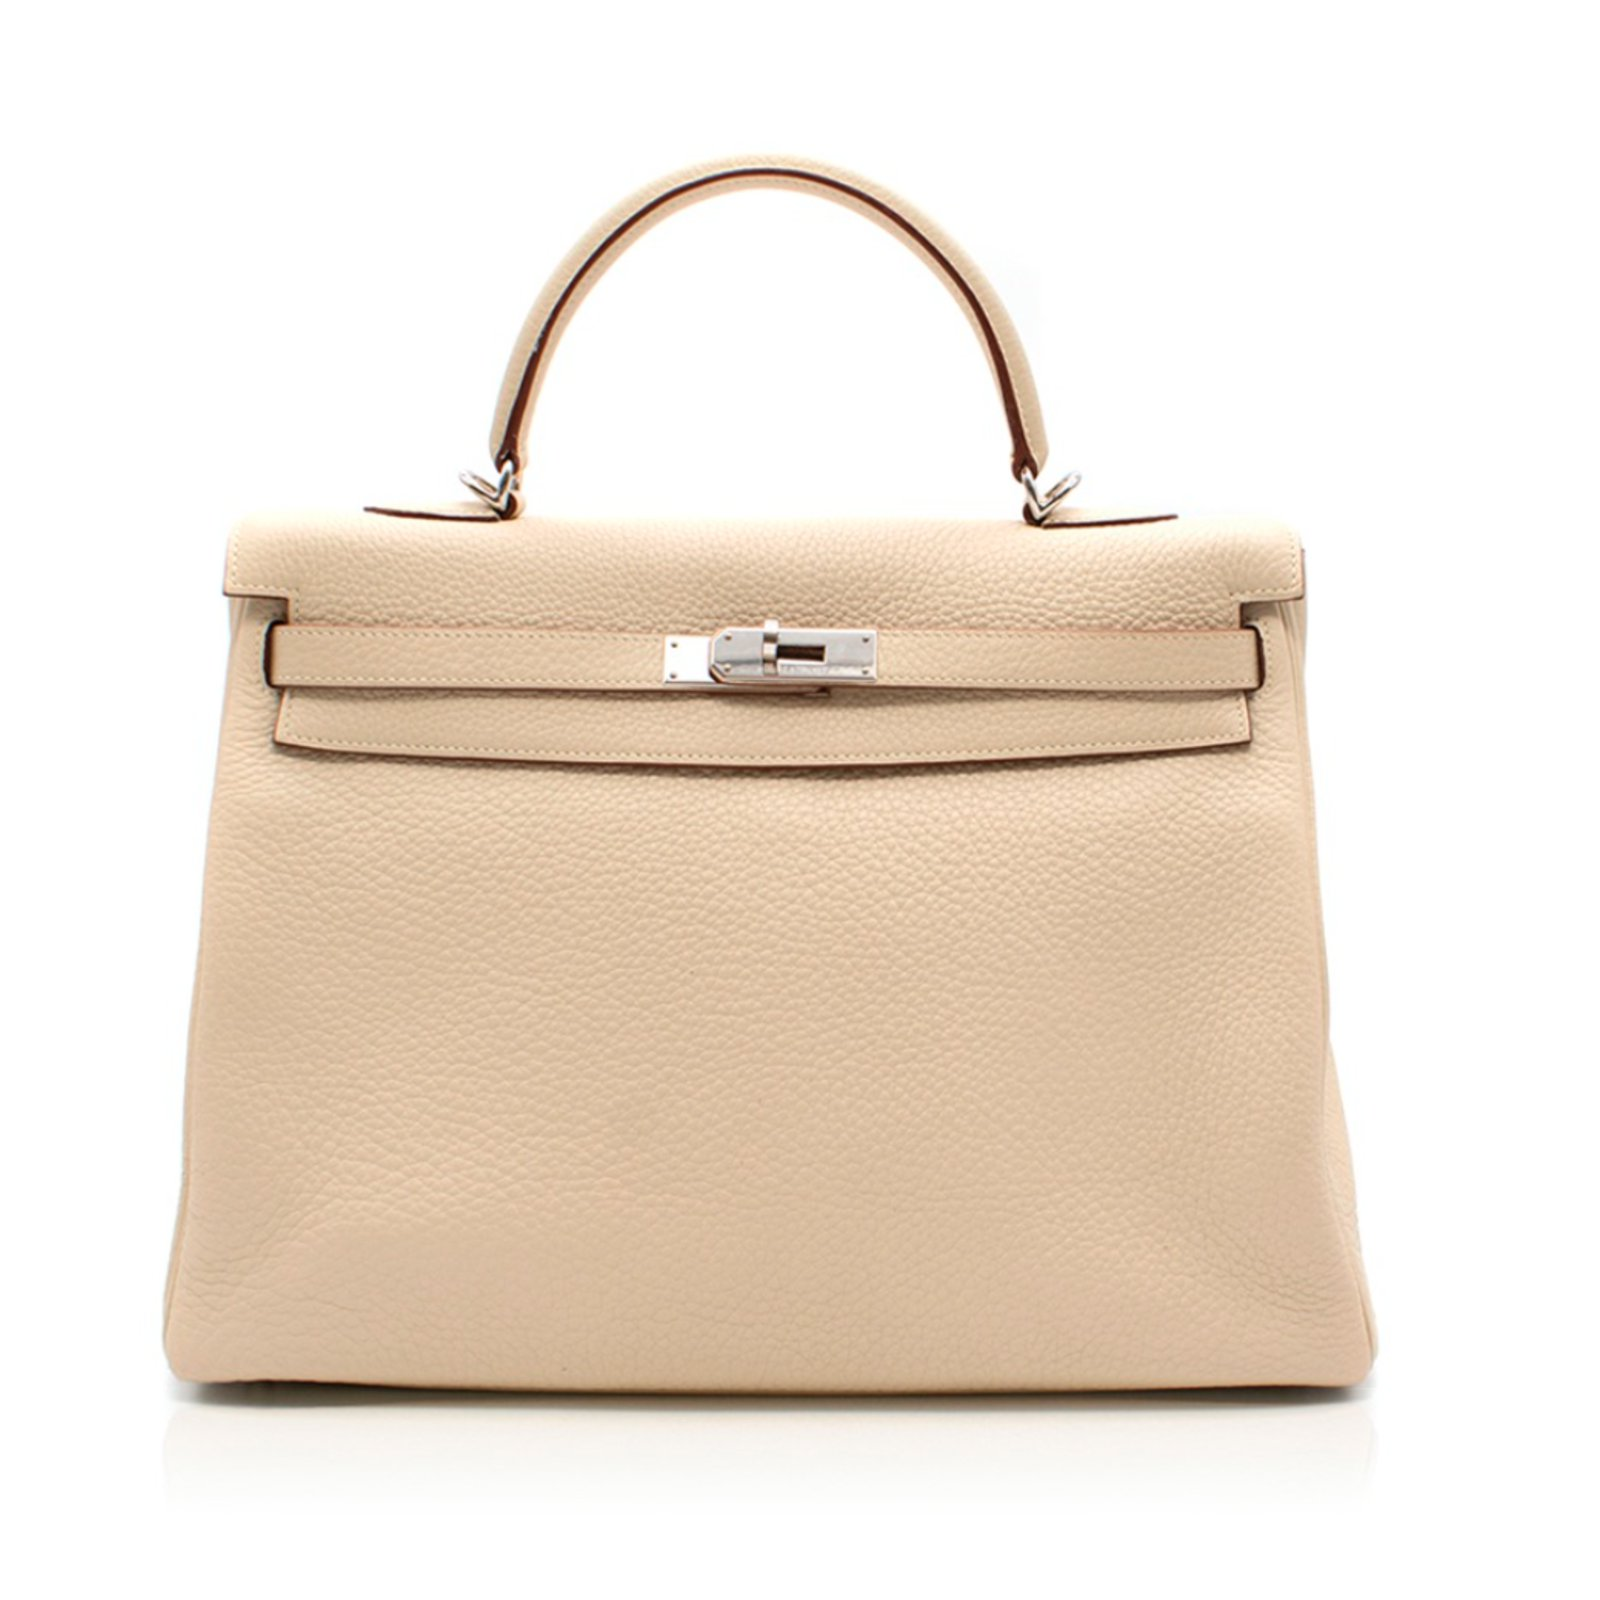 0d92f5cc62 ... new zealand hermès kelly 35 togo parchemin handbags leather beige  ref.66173 5ab83 511bd